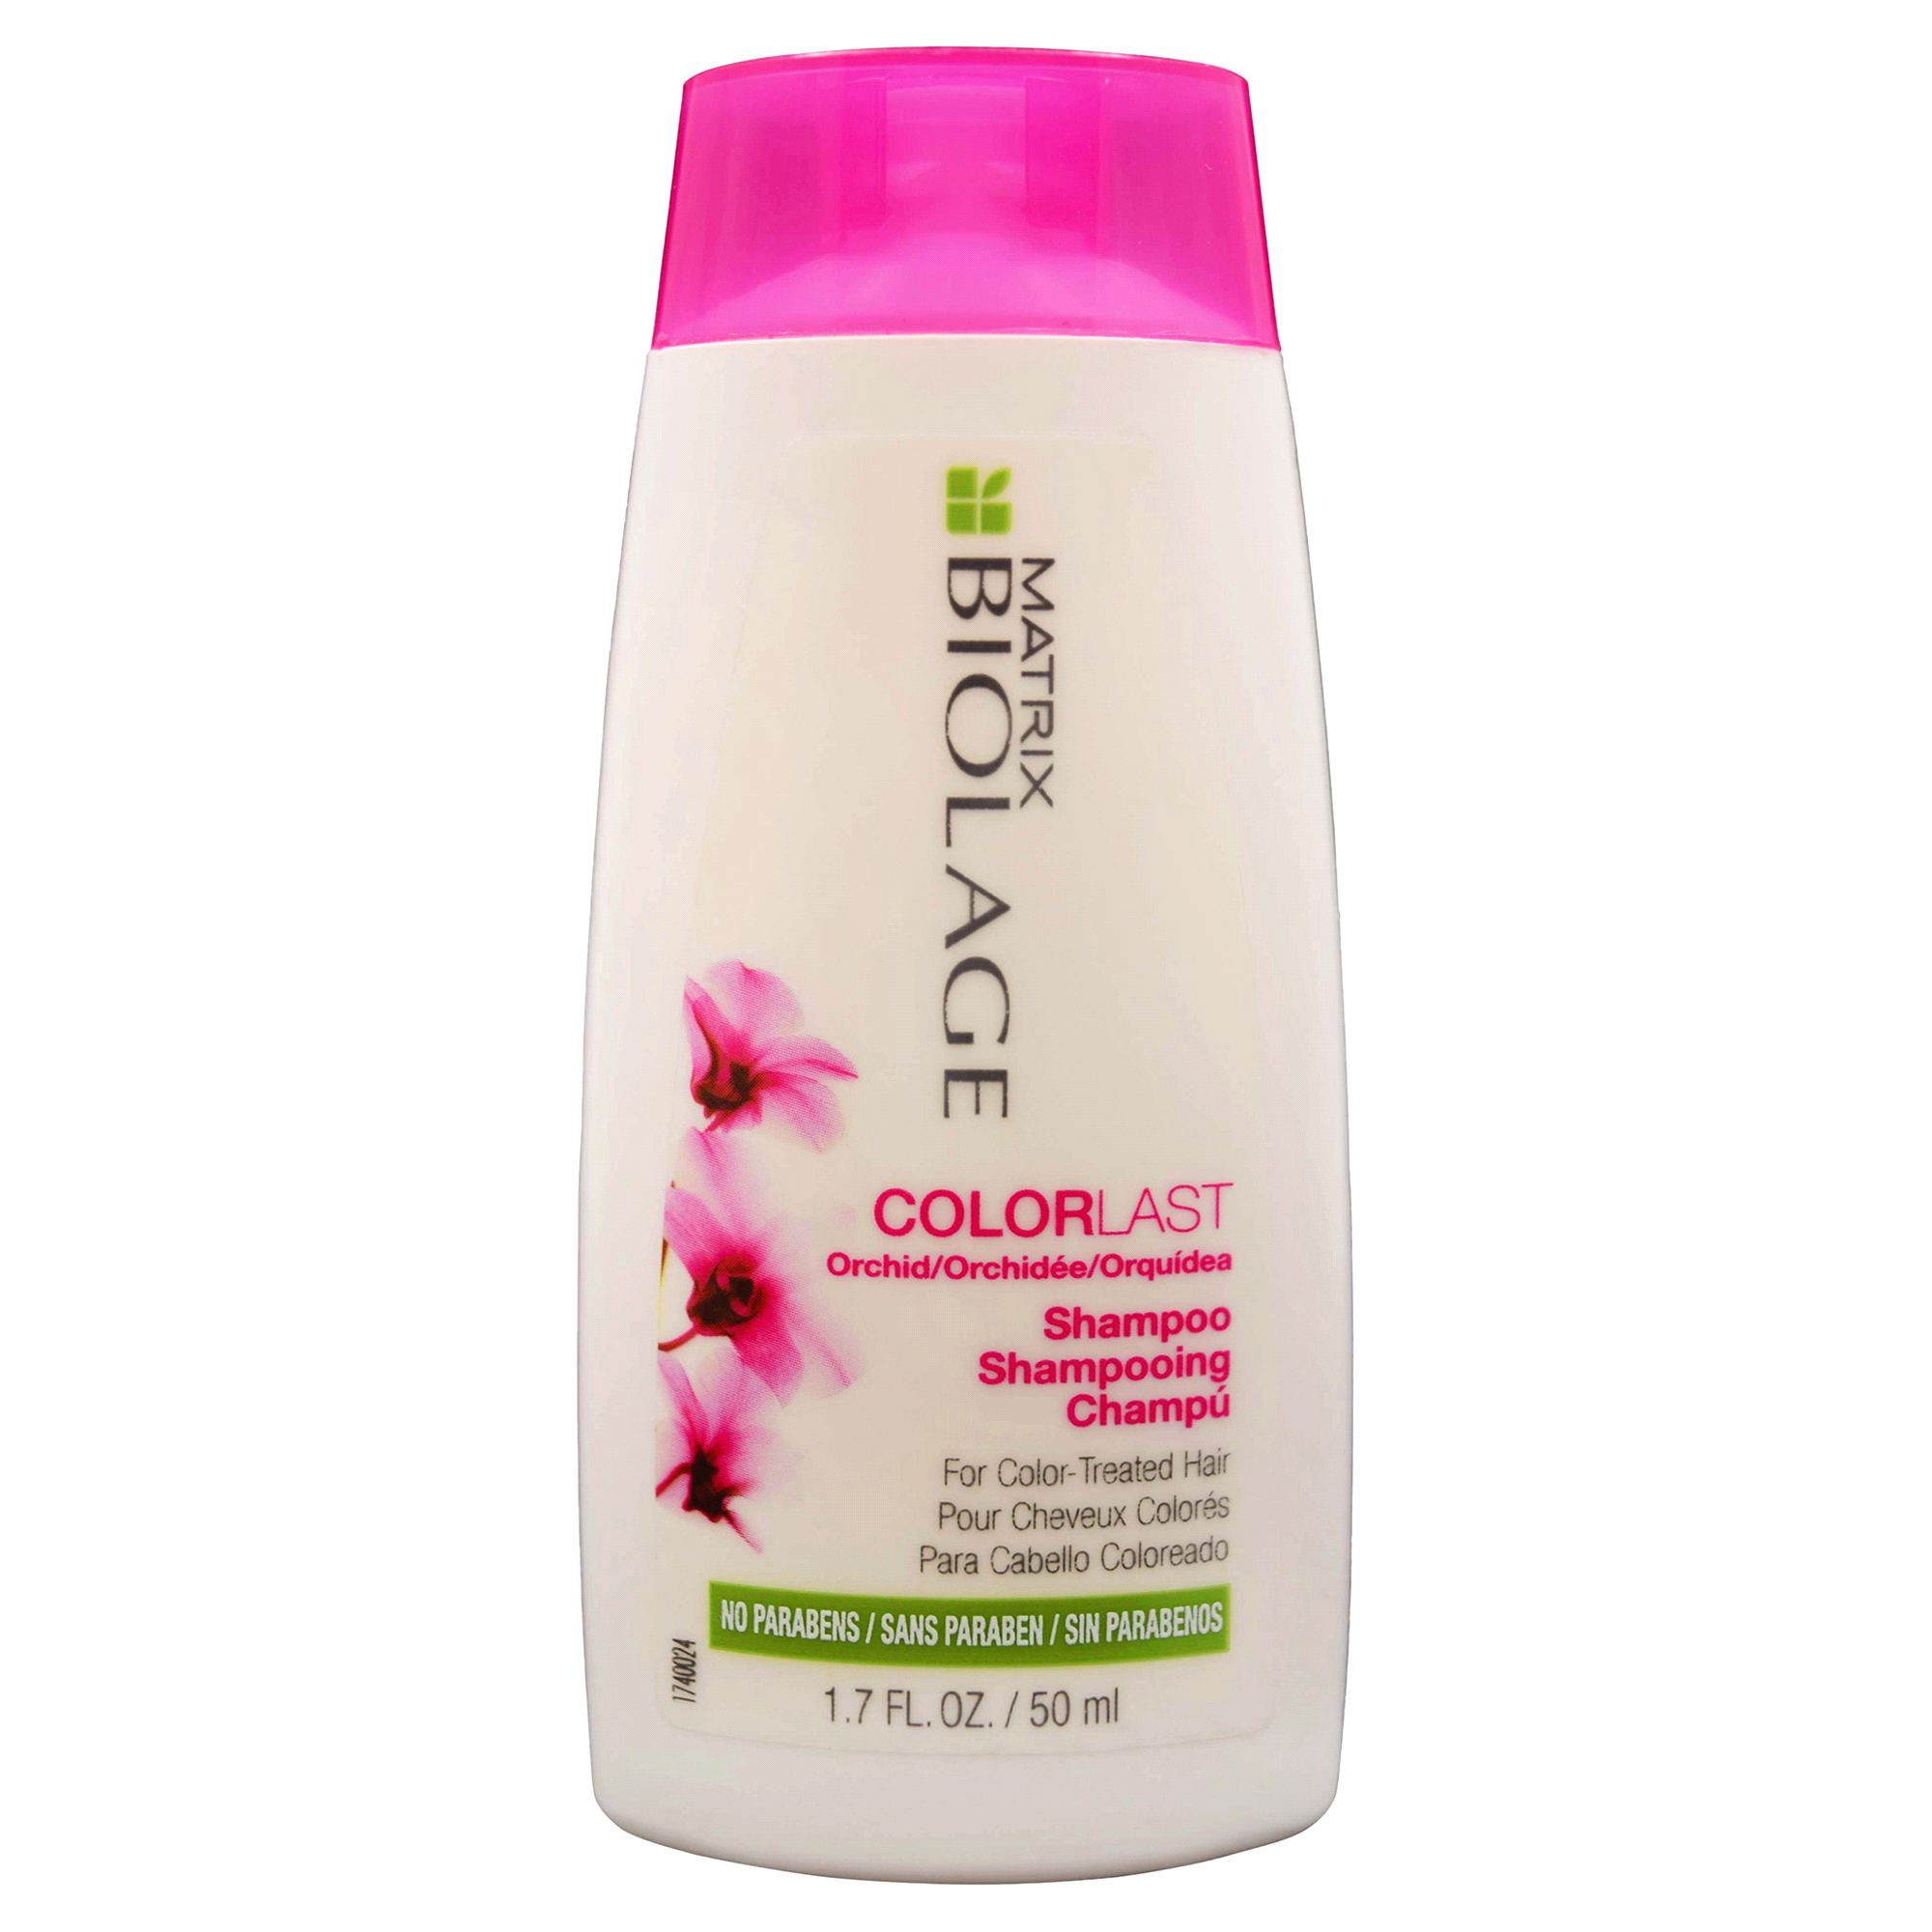 Matrix Biolage Colorlast Shampoo Orchid 1 7 Oz Meijer Com